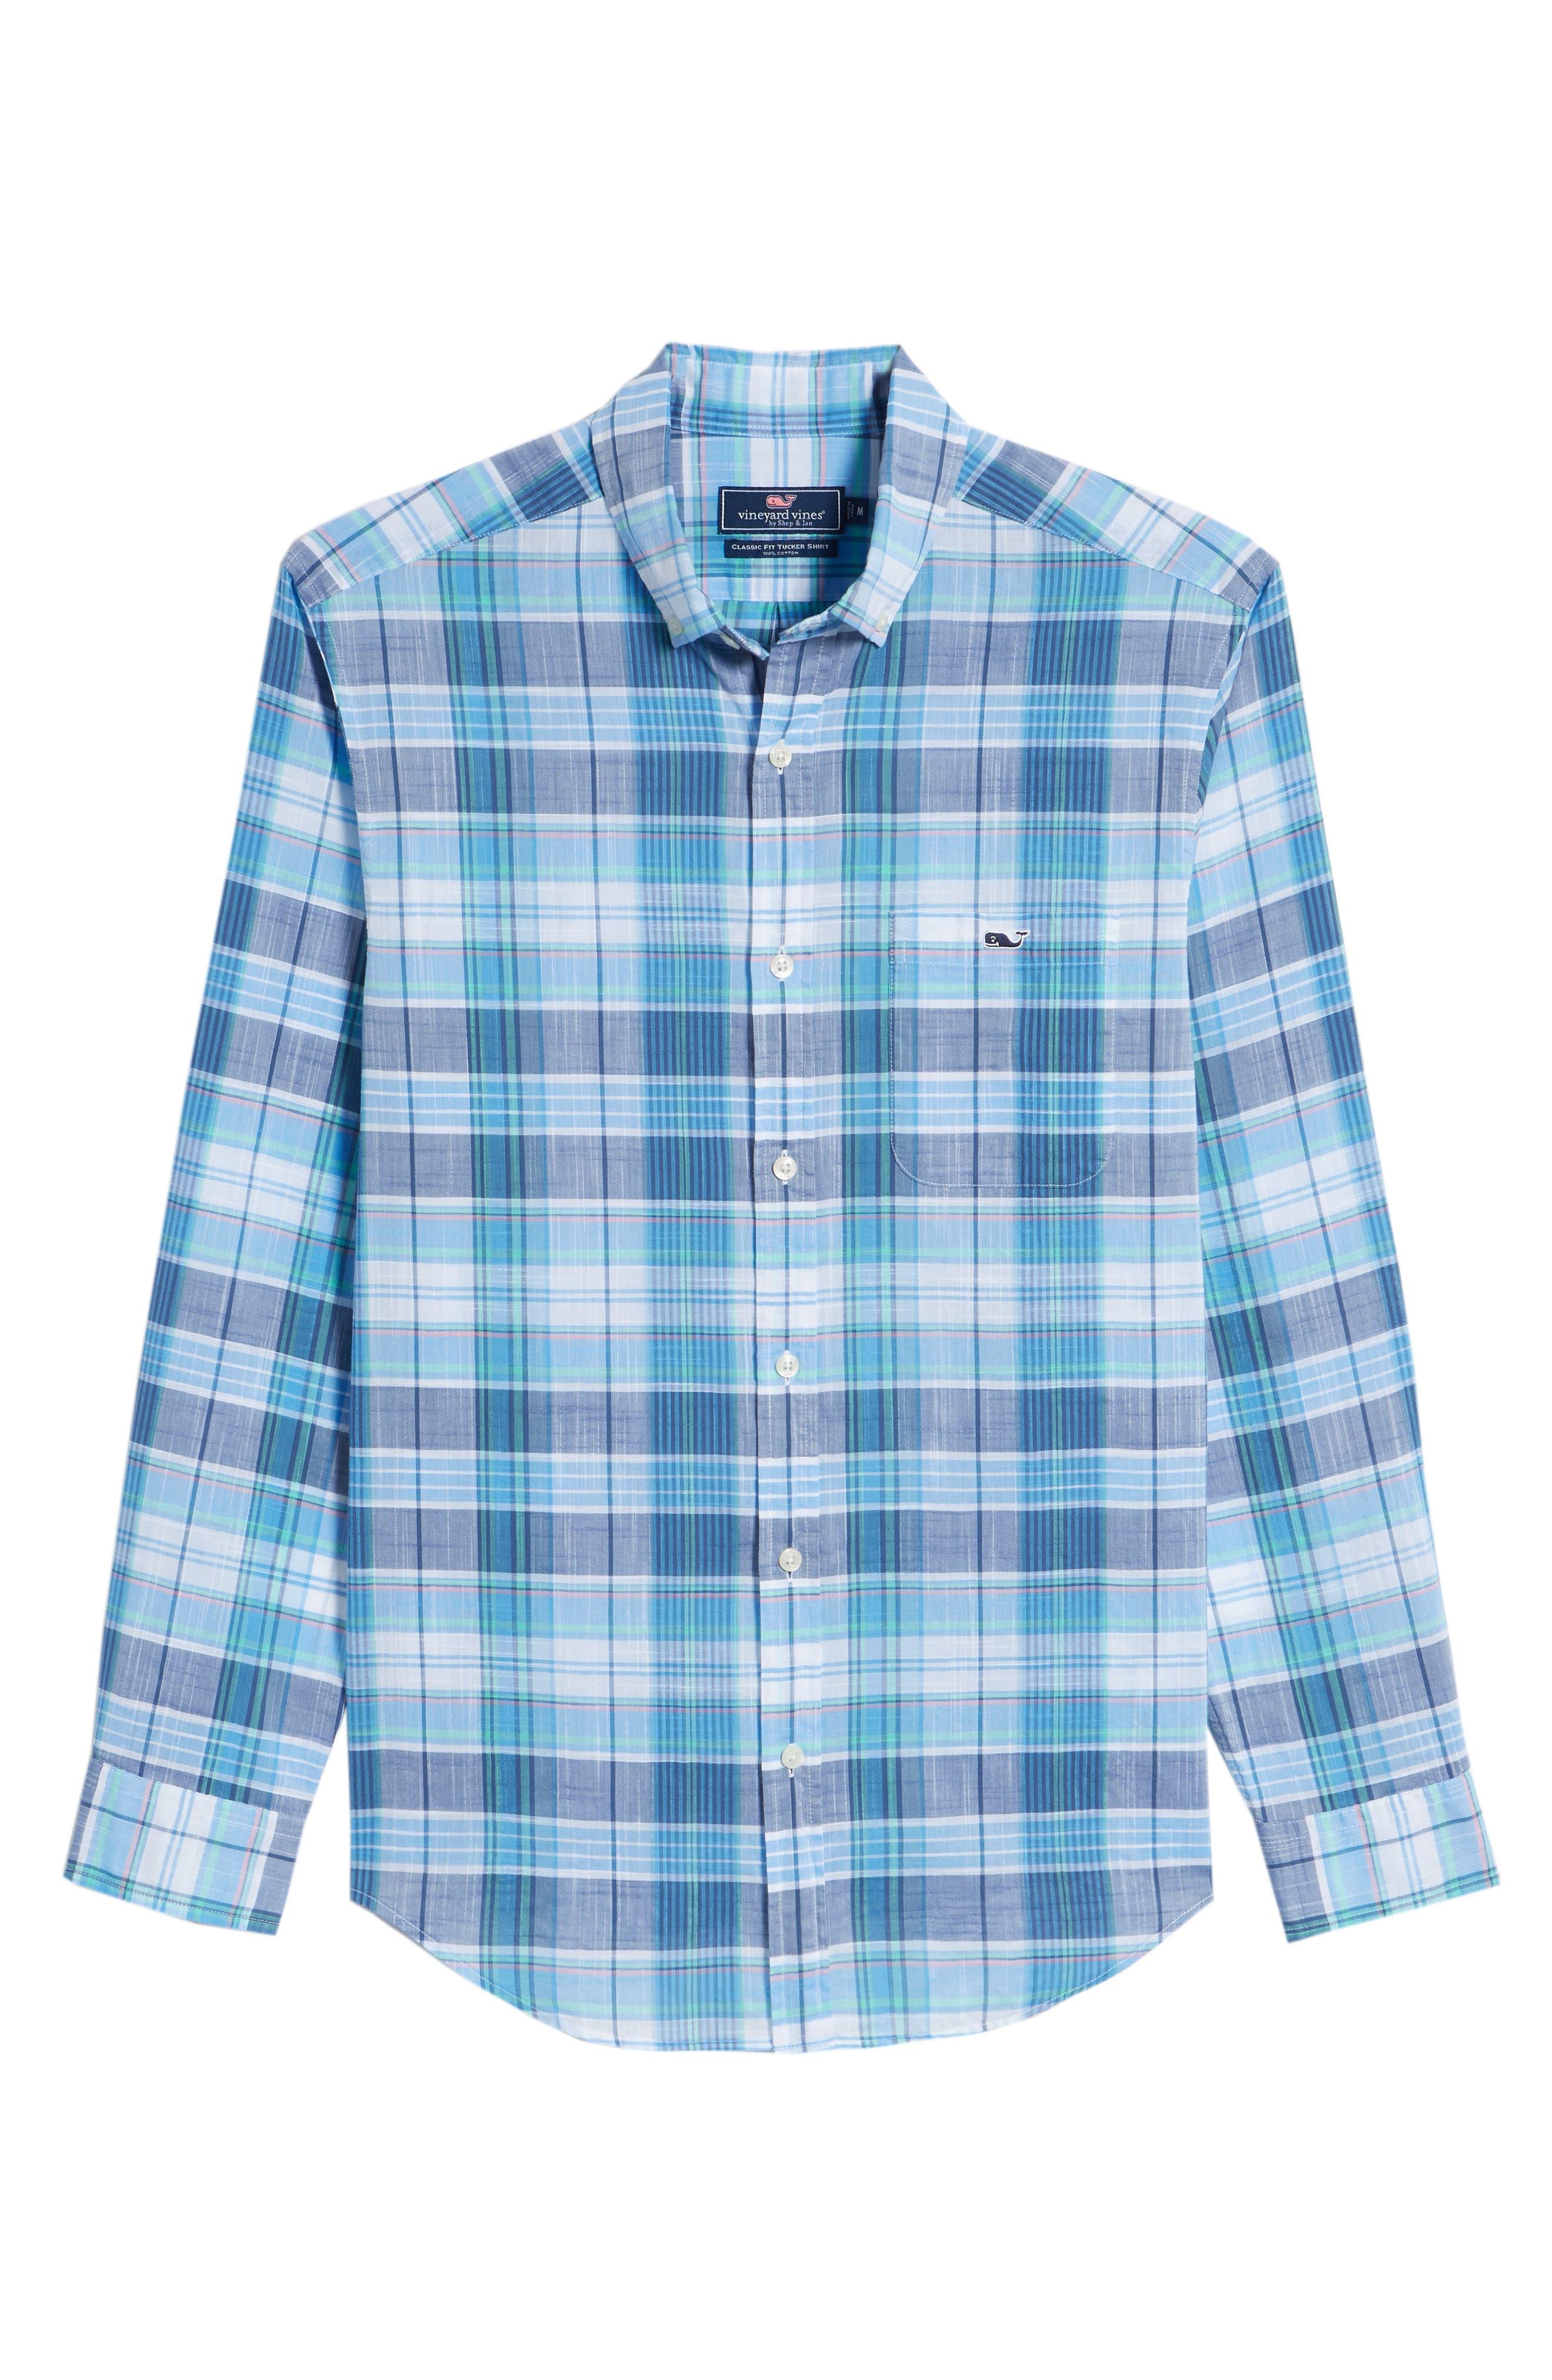 Smith Point Tucker Classic Fit Plaid Sport Shirt,                             Alternate thumbnail 3, color,                             Moonshine